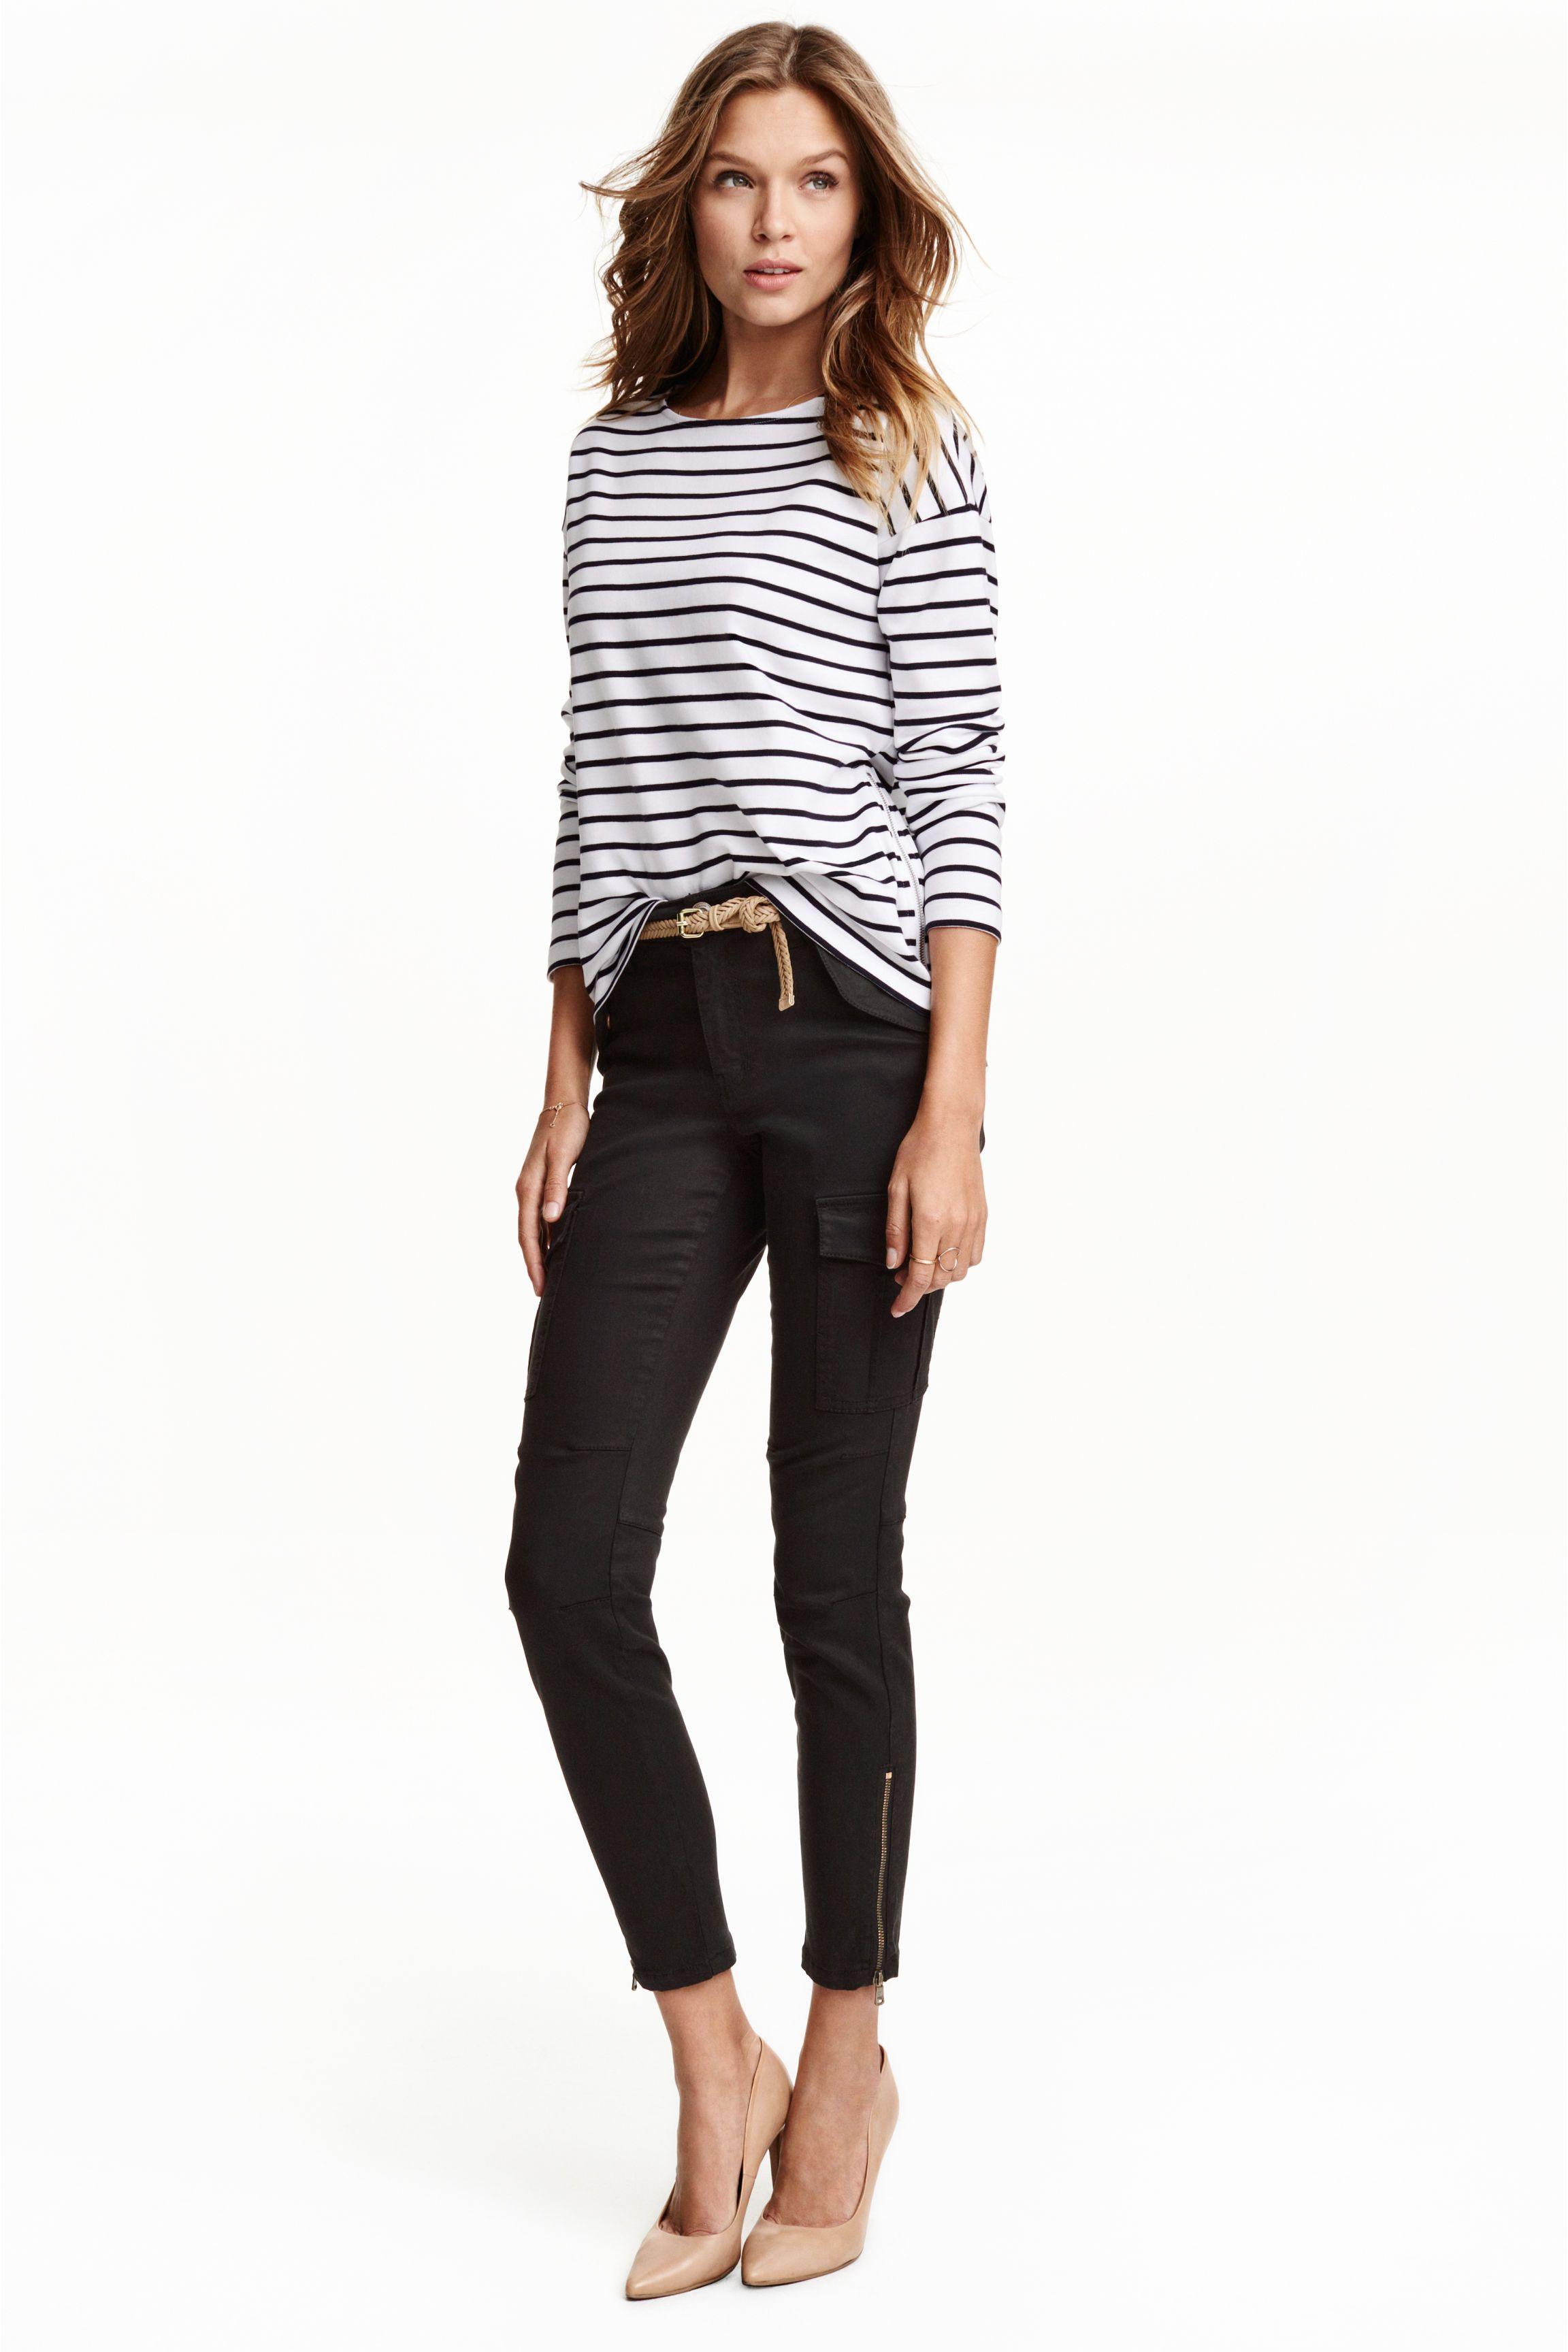 Cargo pants in a lyocell blend - Black - Ladies | H&M GB